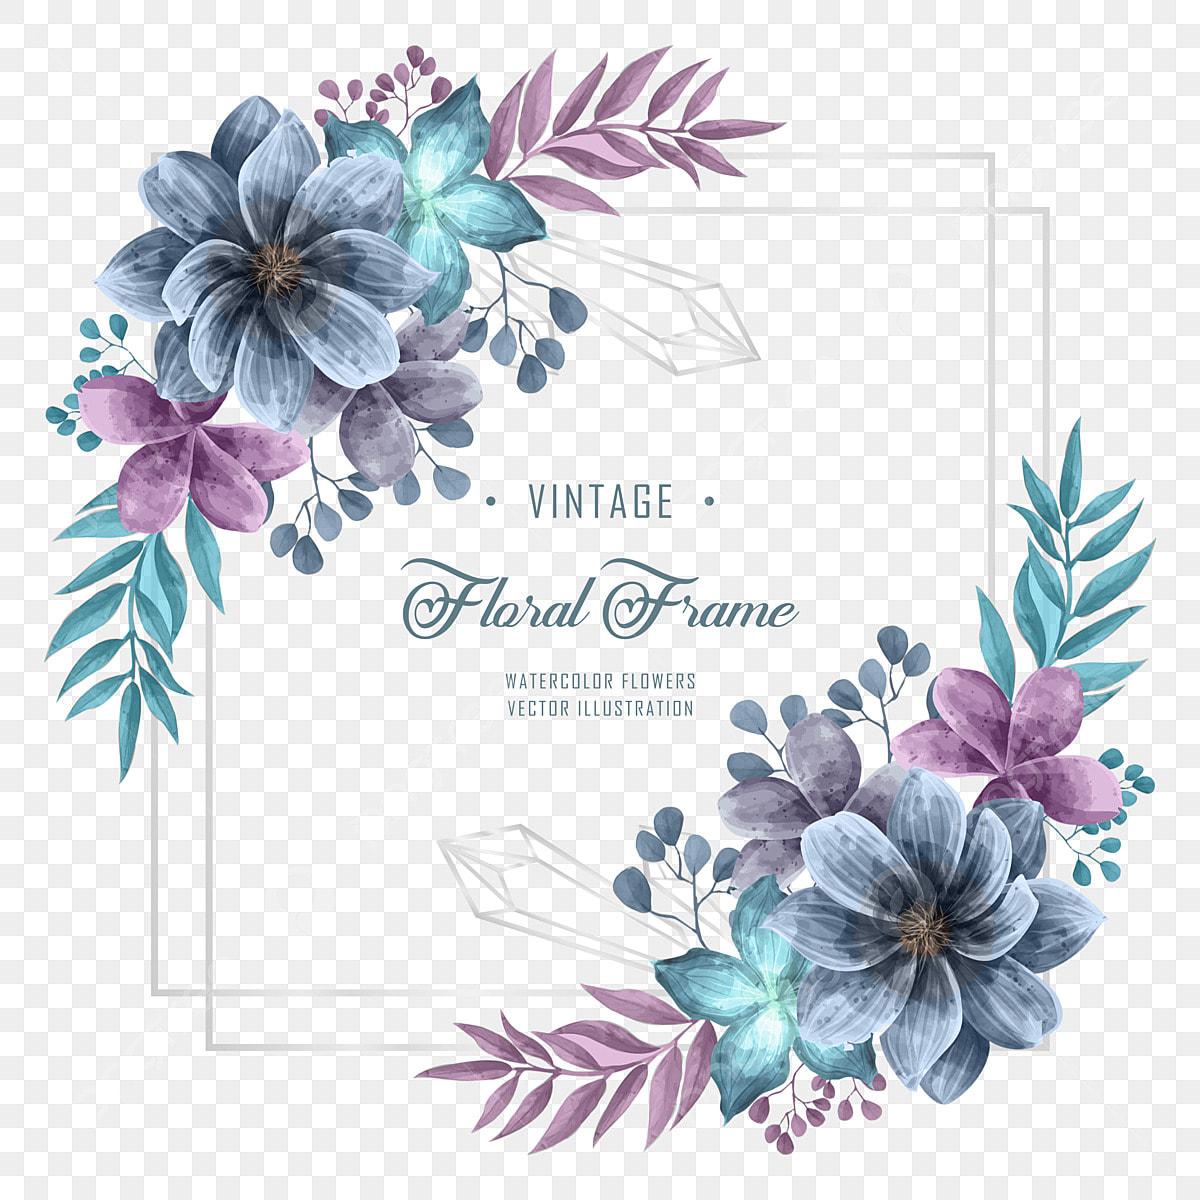 Purple Flower Wedding: Wedding Invitation With Blue And Purple Watercolor Flower